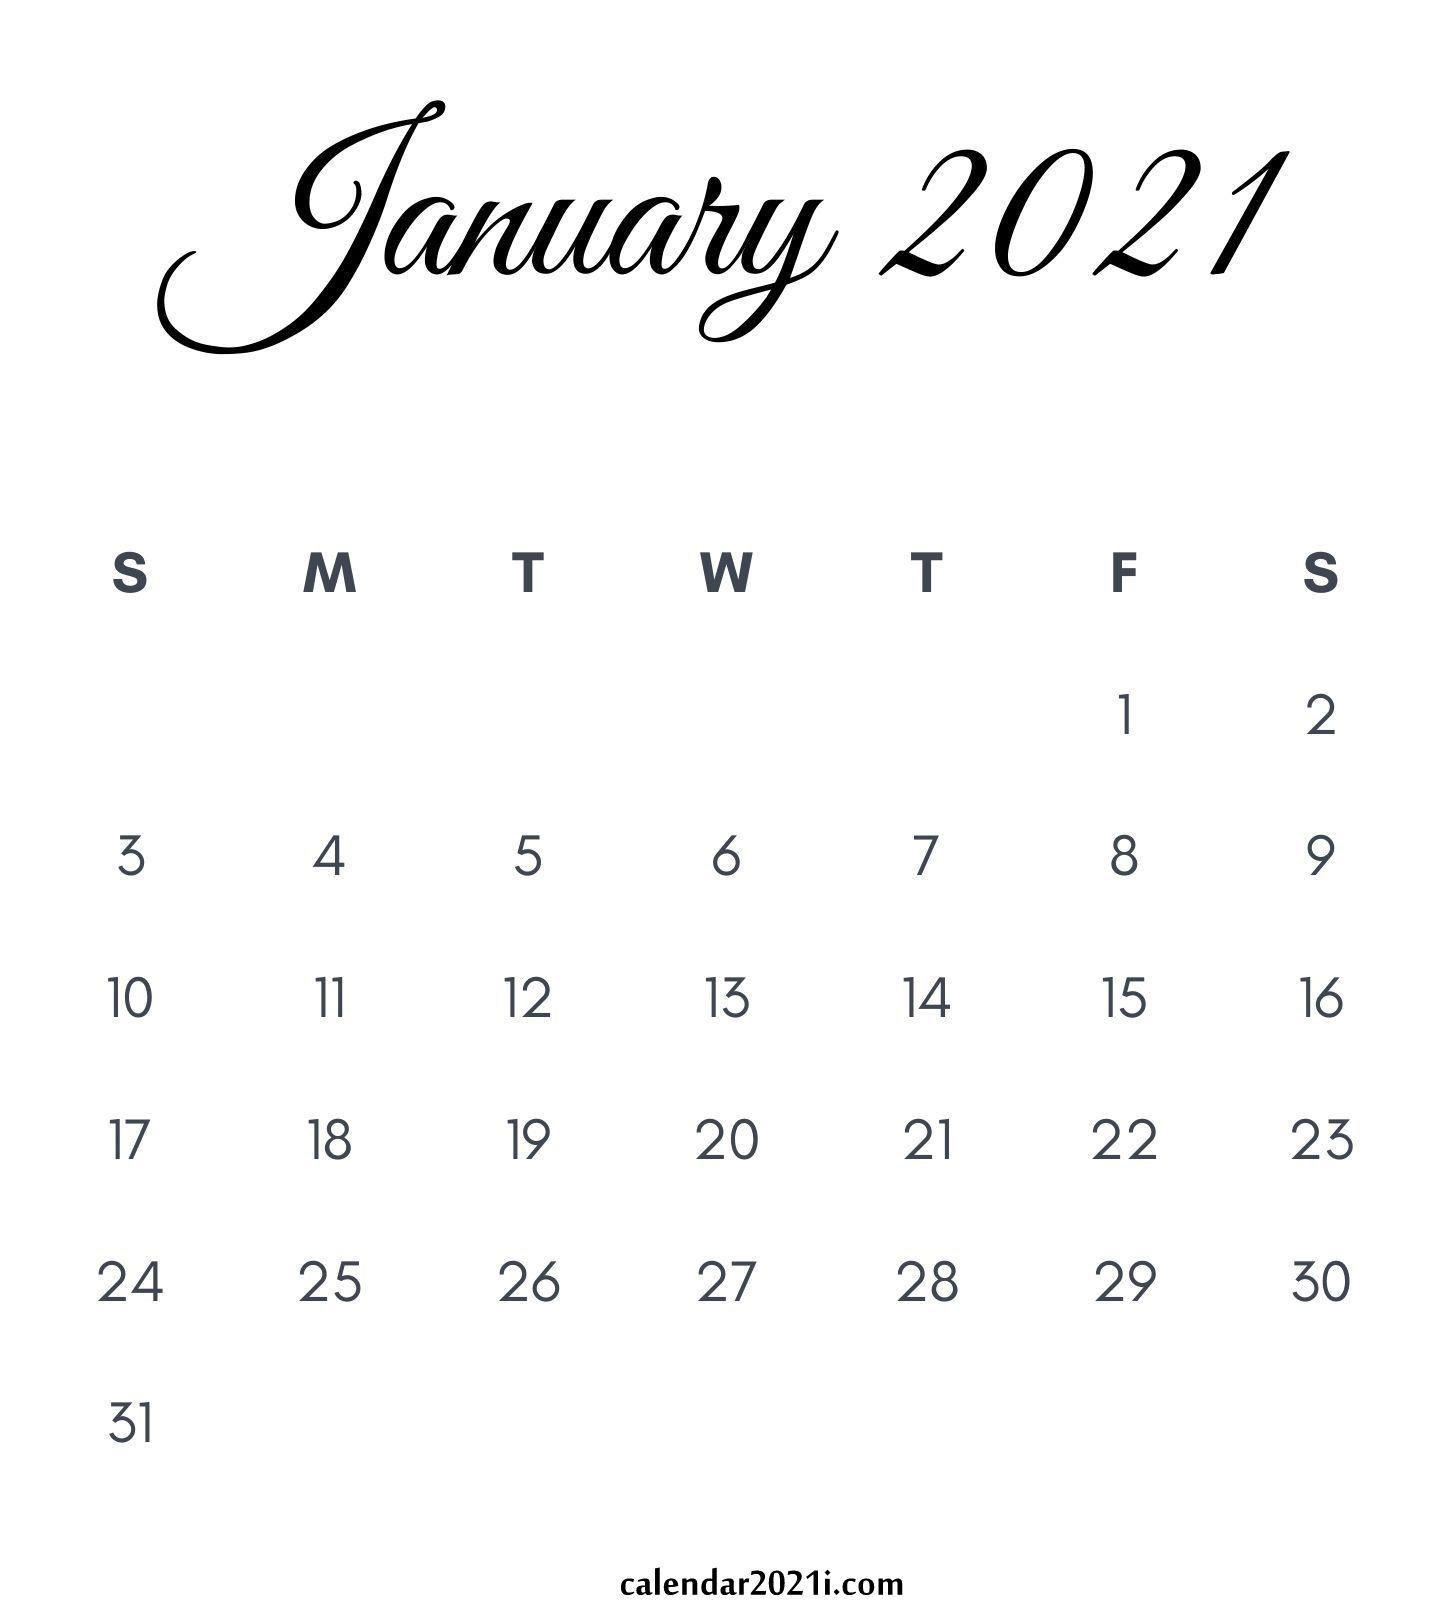 January 2021 Calendar Printable Wallpaper Floral Holidays 1450x1600